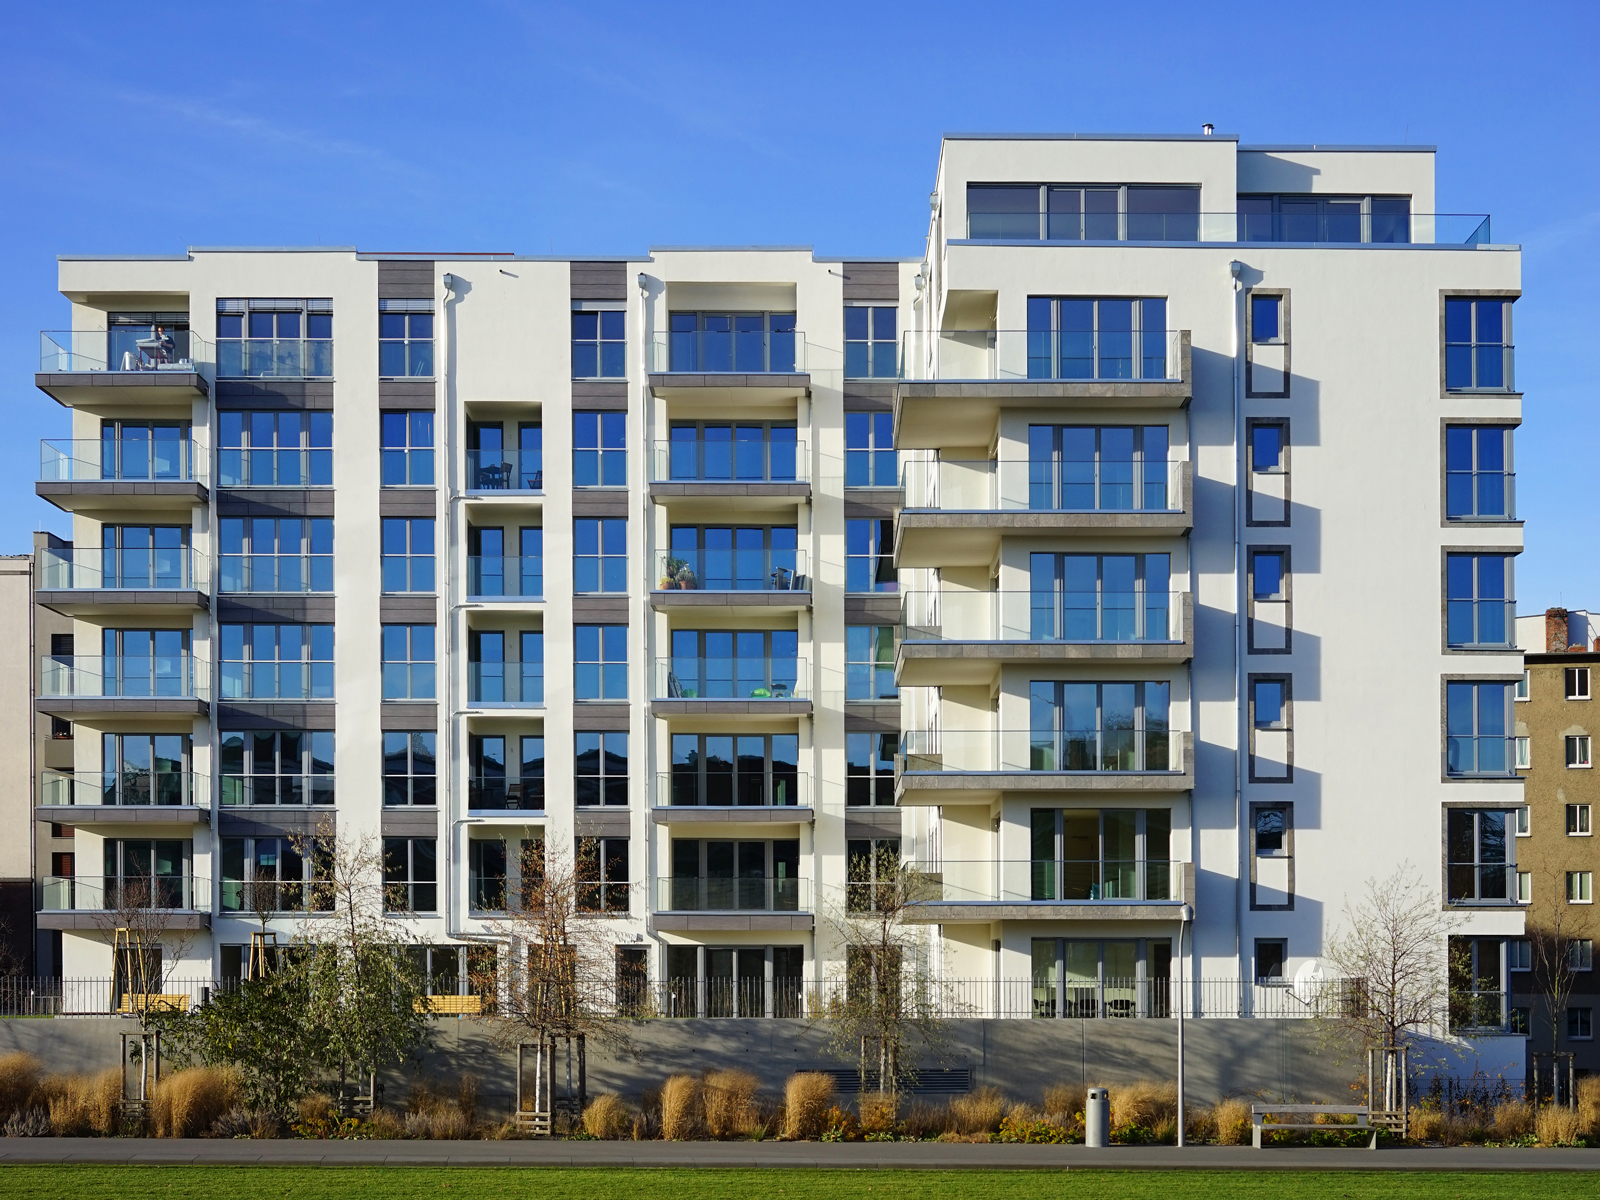 Appartment In Berlin Flottwellpromenade Housing Faber